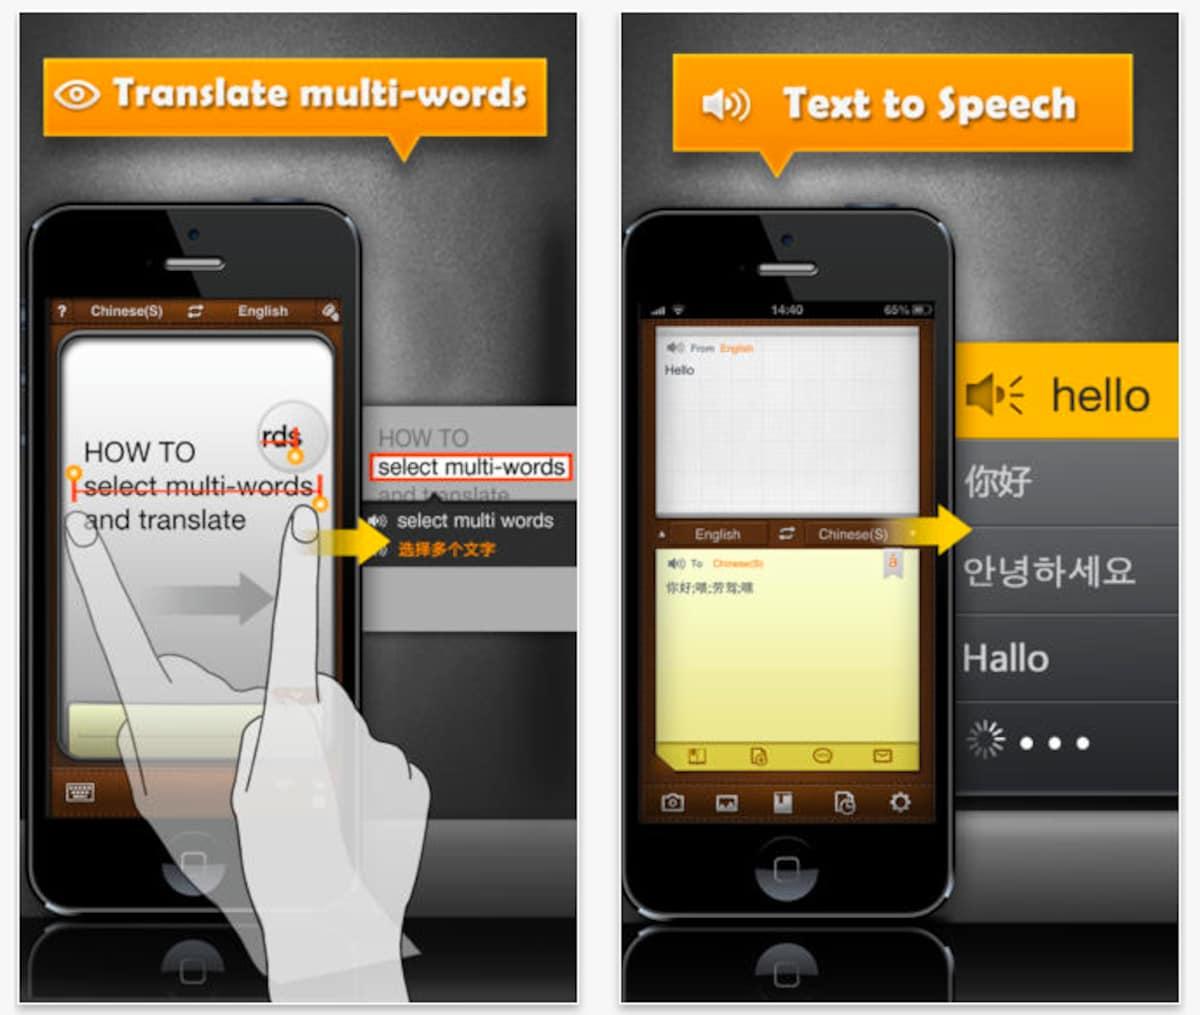 4. app สื่อสารภาษาญี่ปุ่น CamDictionary Free